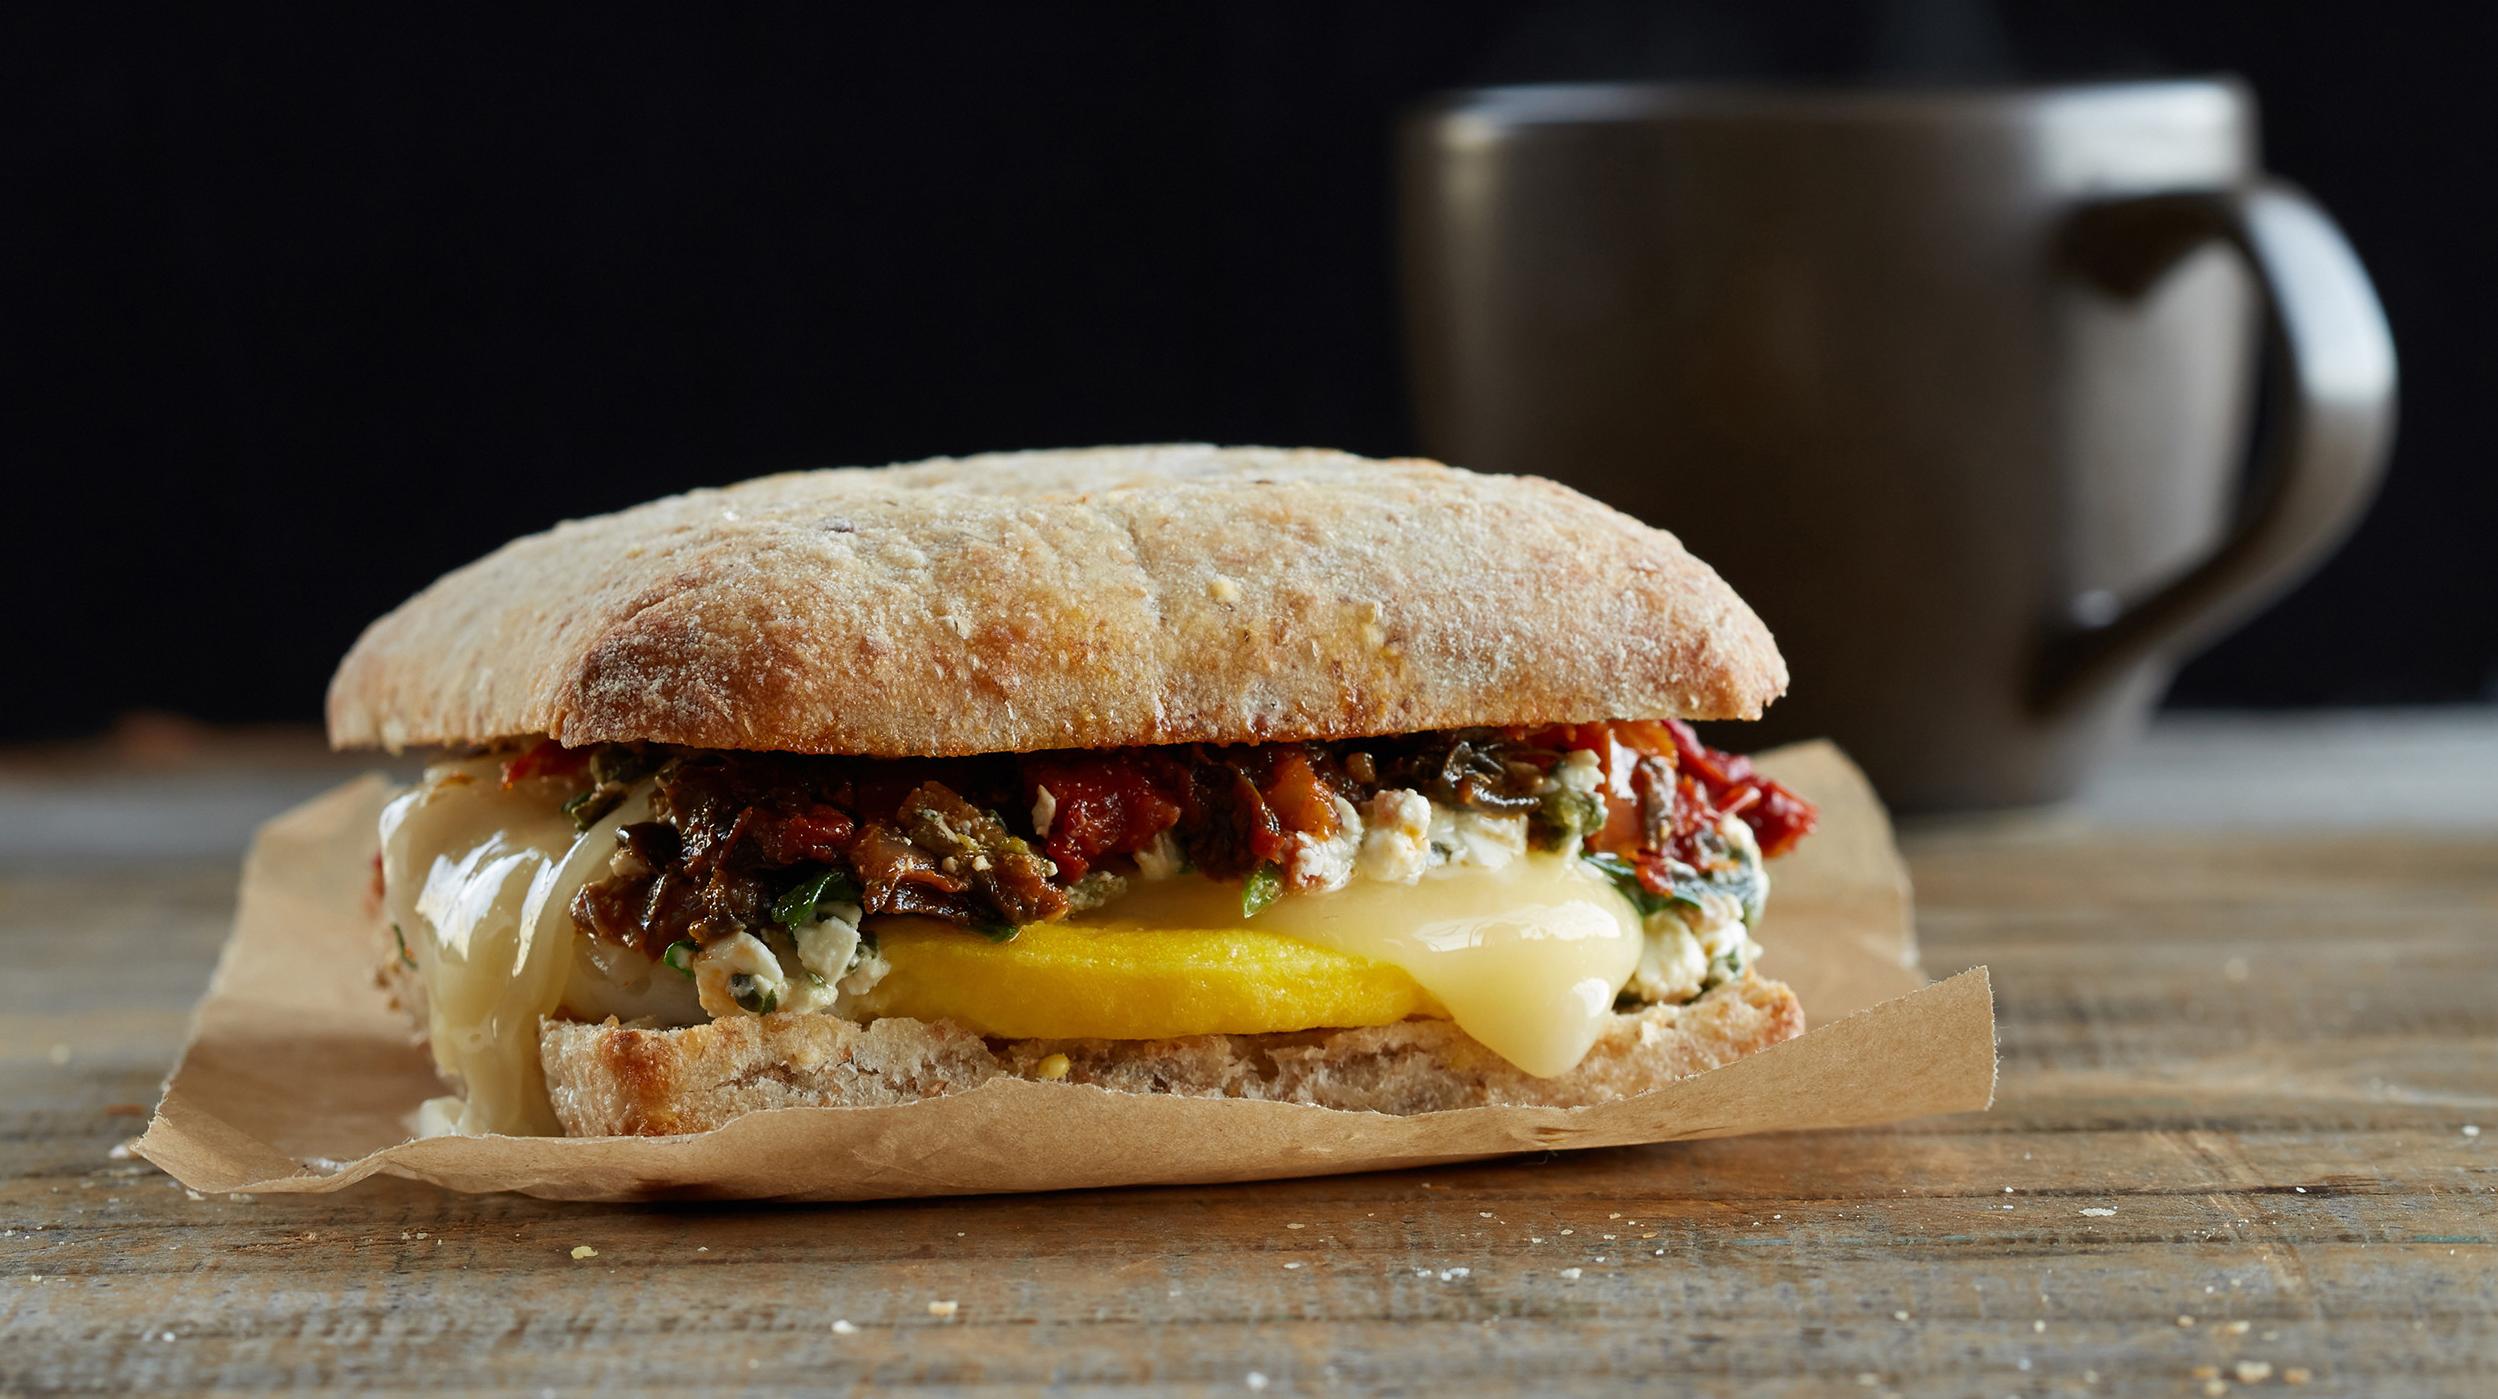 Starbucks introduces its first 'gluten-free breakfast sandwich'